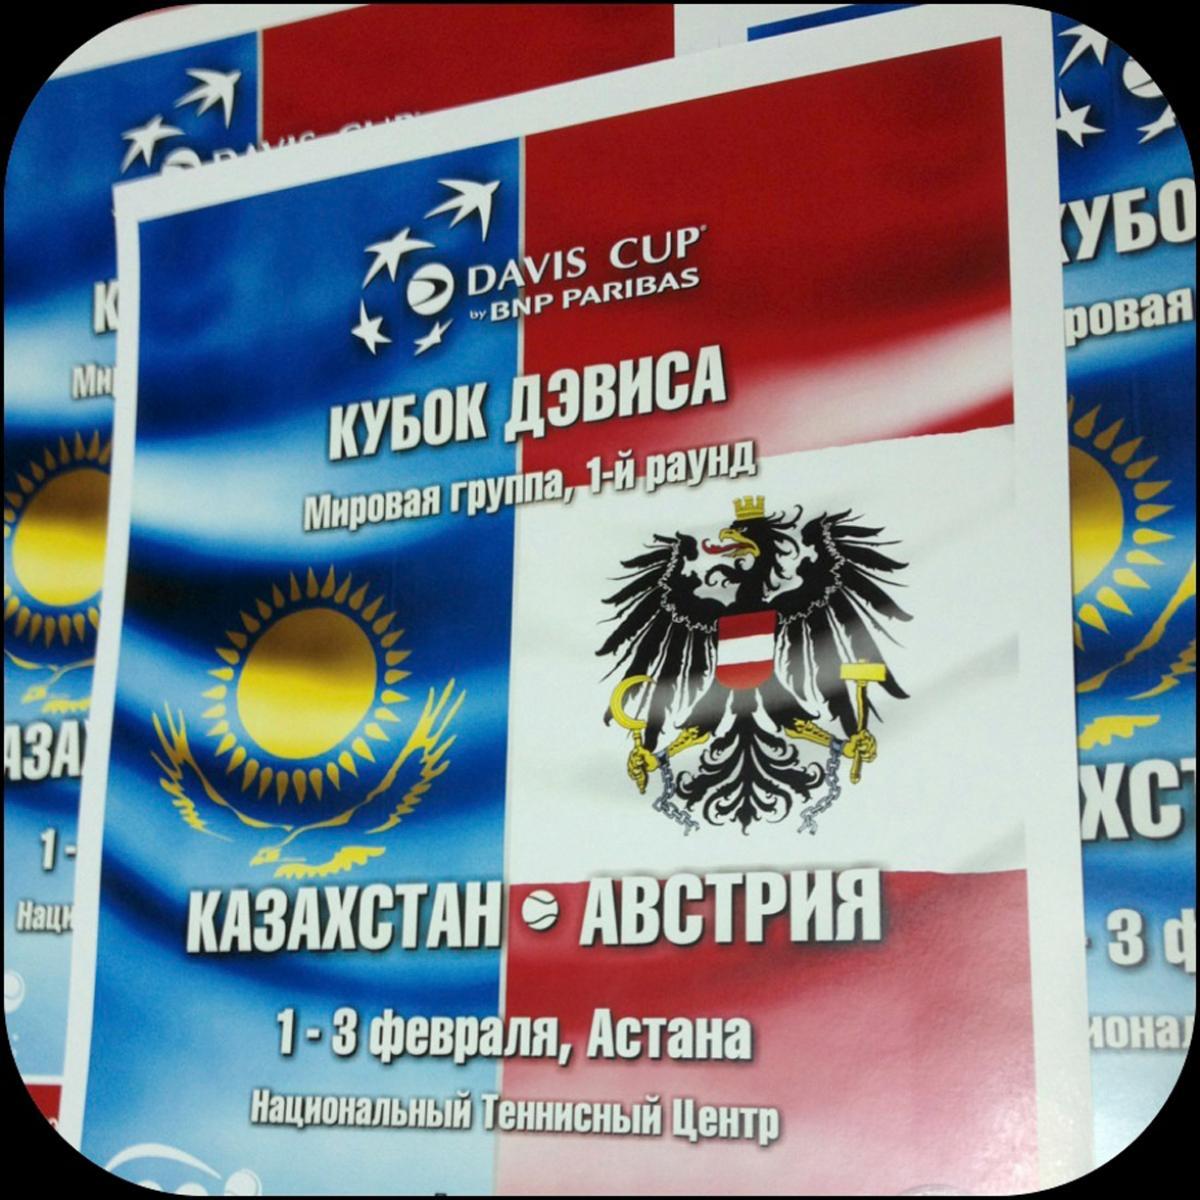 Astana Kachastan Davis Cup 2013